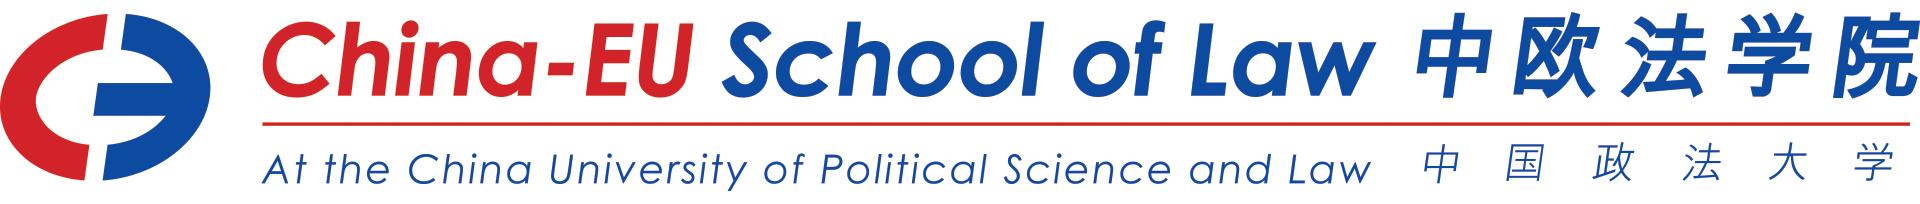 China-EU School of Law